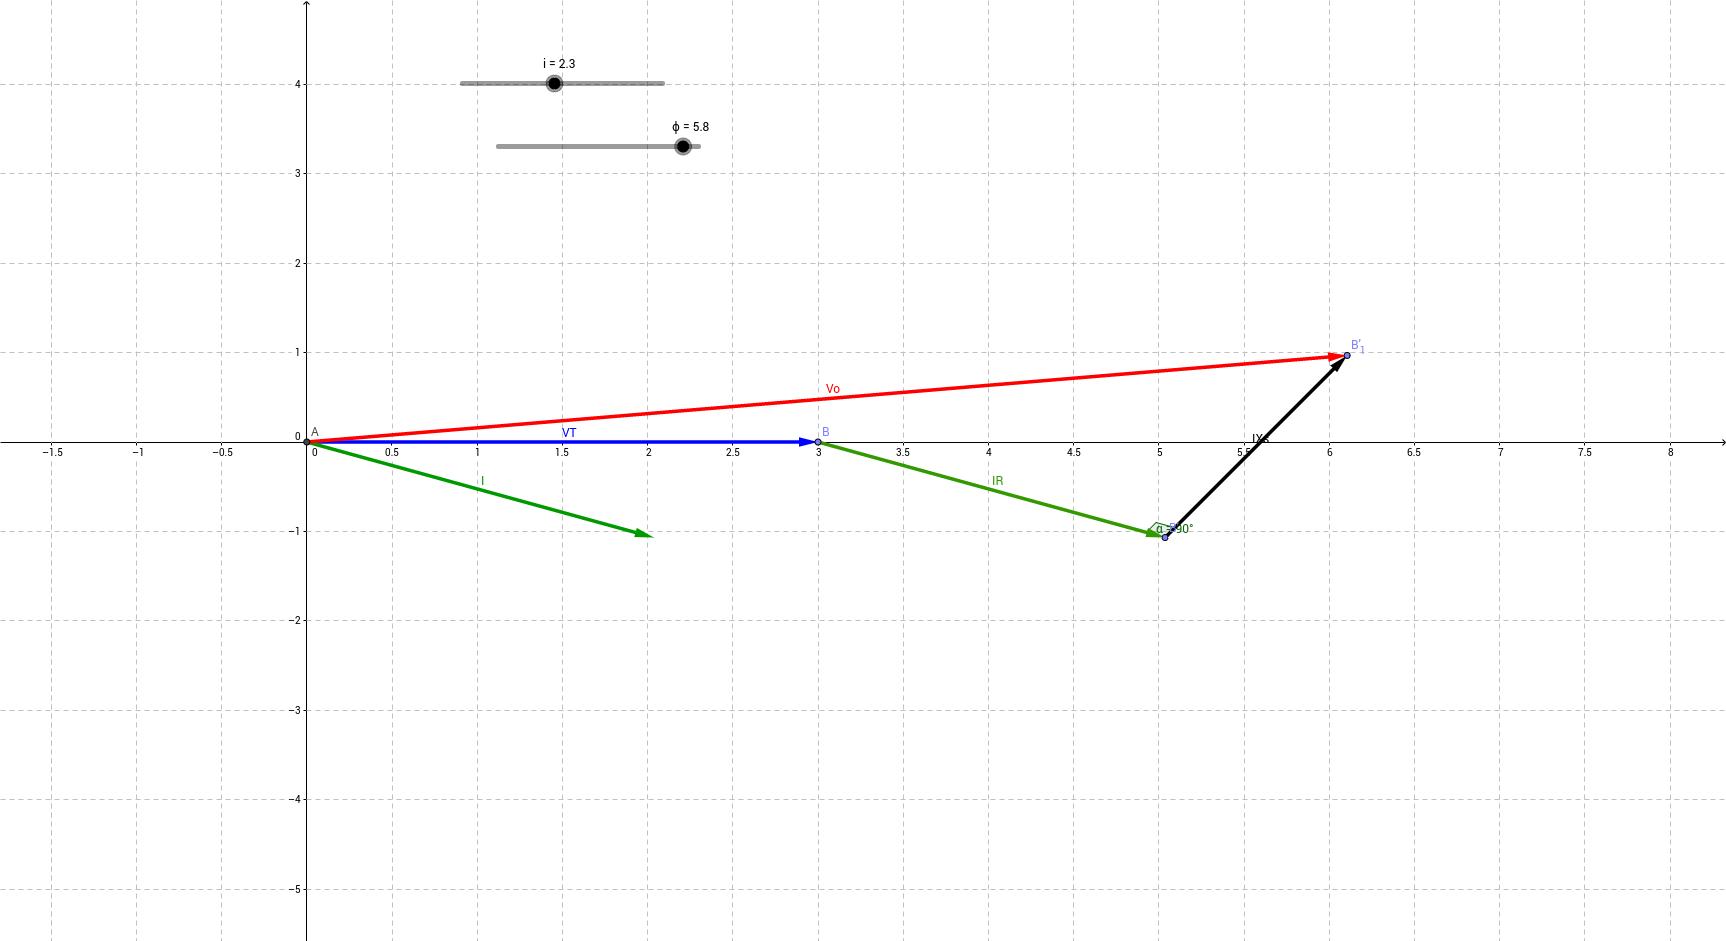 Synchronous Machine Phasor Diagram